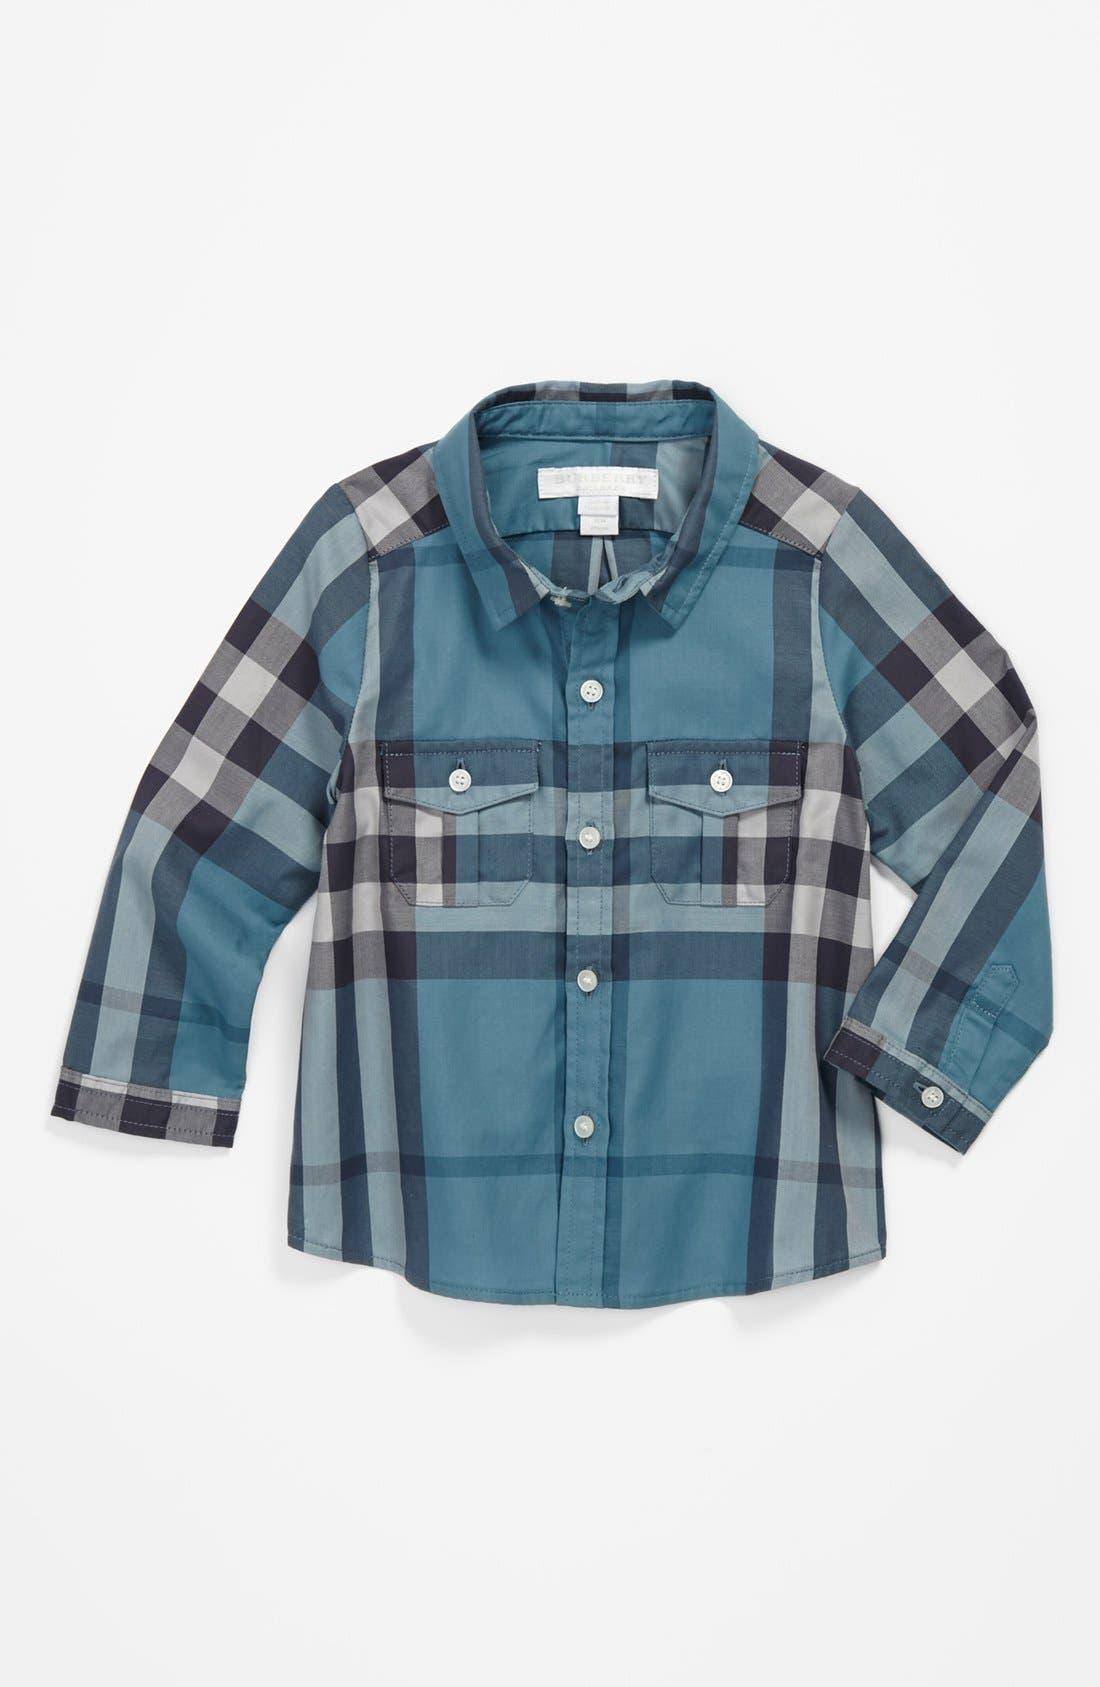 Main Image - Burberry 'Trent' Check Shirt (Toddler Boys)